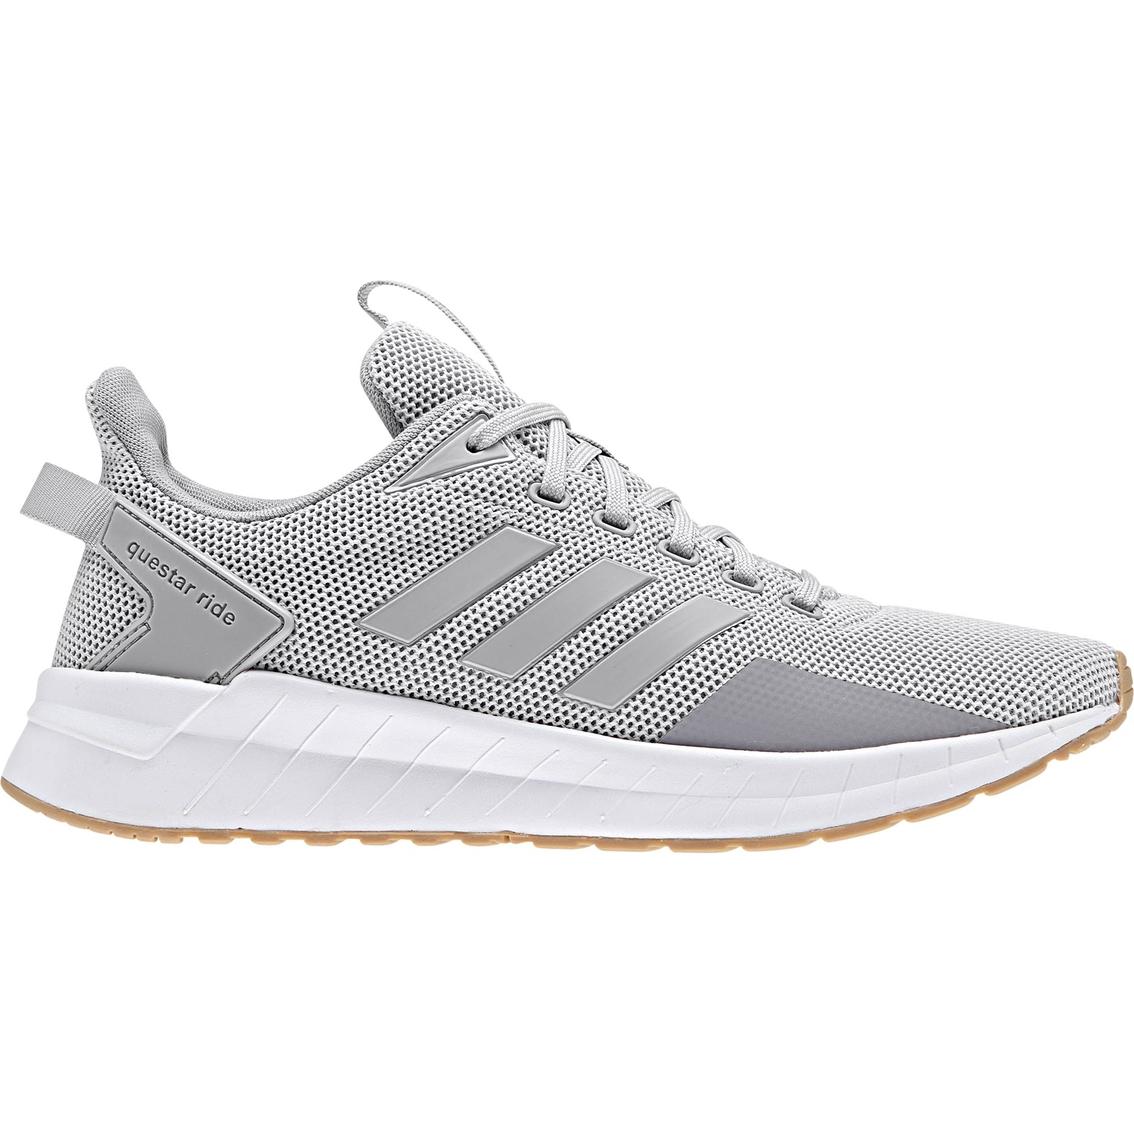 finest selection 0d454 c9e08 Adidas Women's Questar Ride Running Shoes | Running | Shoes ...